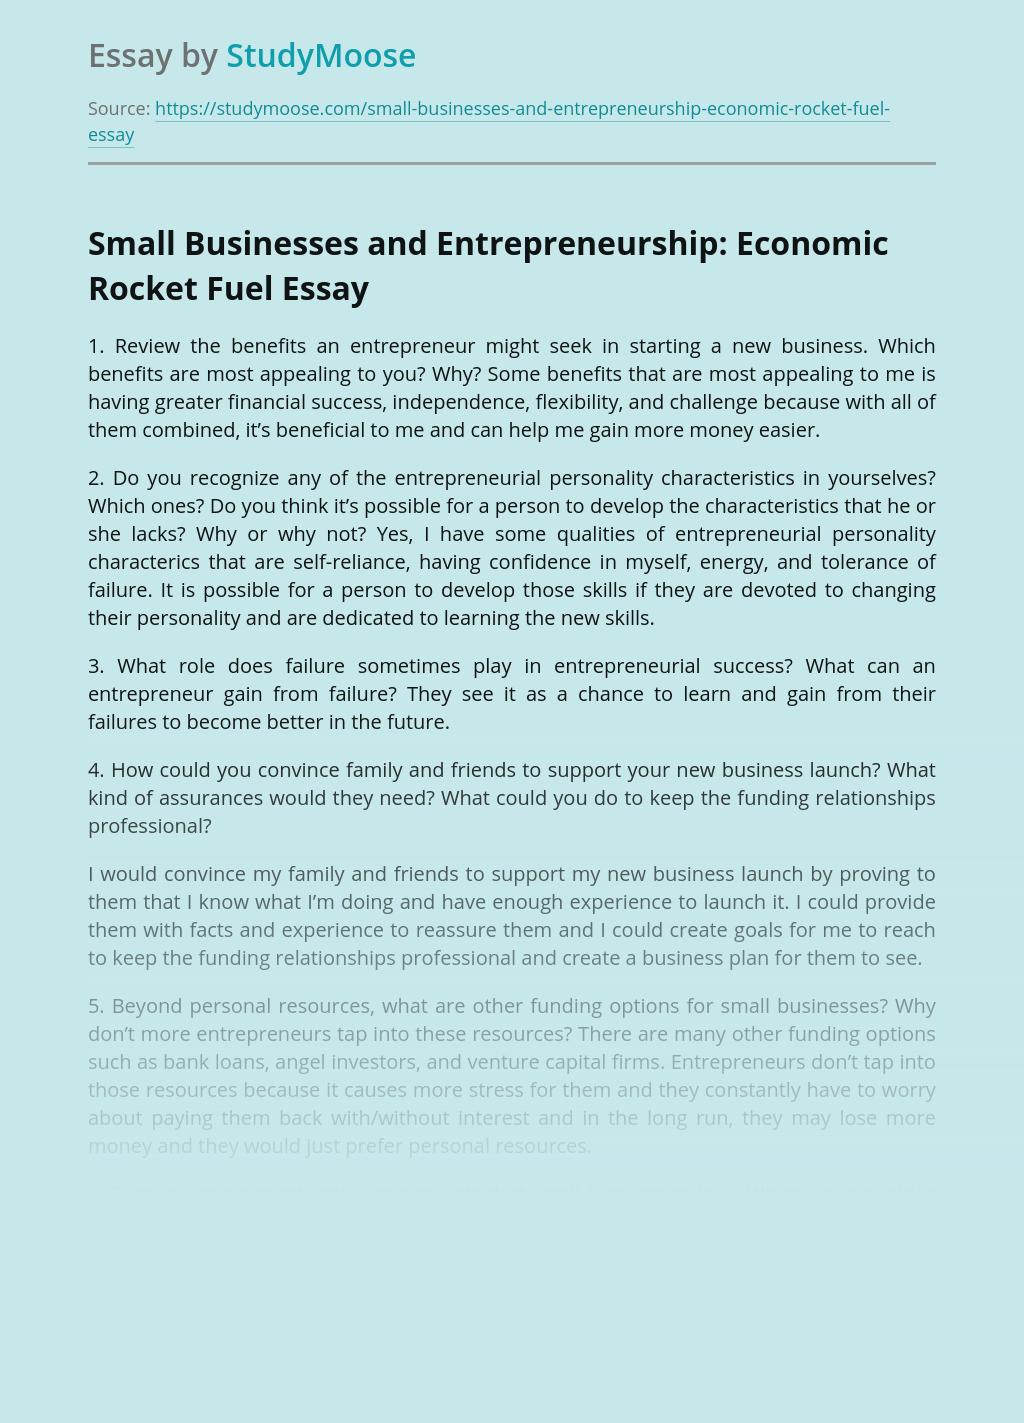 Small Businesses and Entrepreneurship: Economic Rocket Fuel